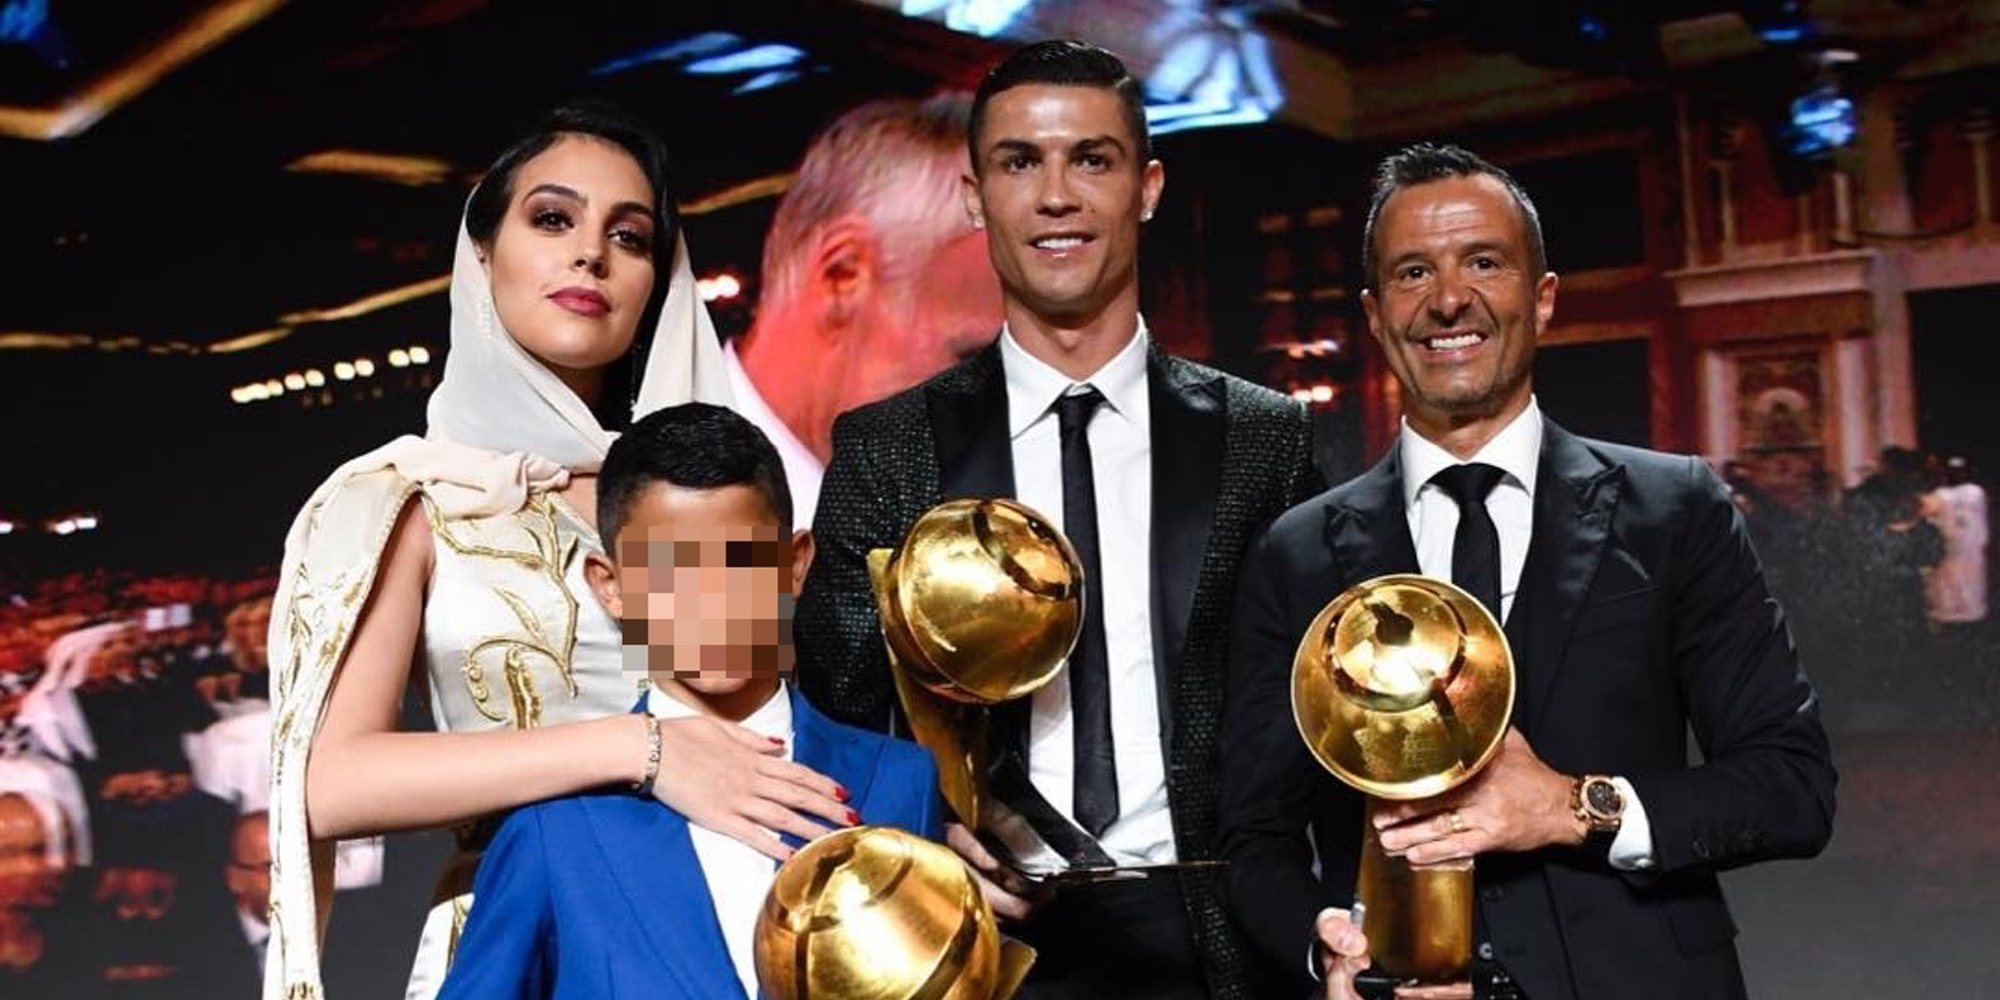 El exotismo de Georgina Rodríguez acompañando a Cristiano Ronaldo en los Globe Soccer Awards